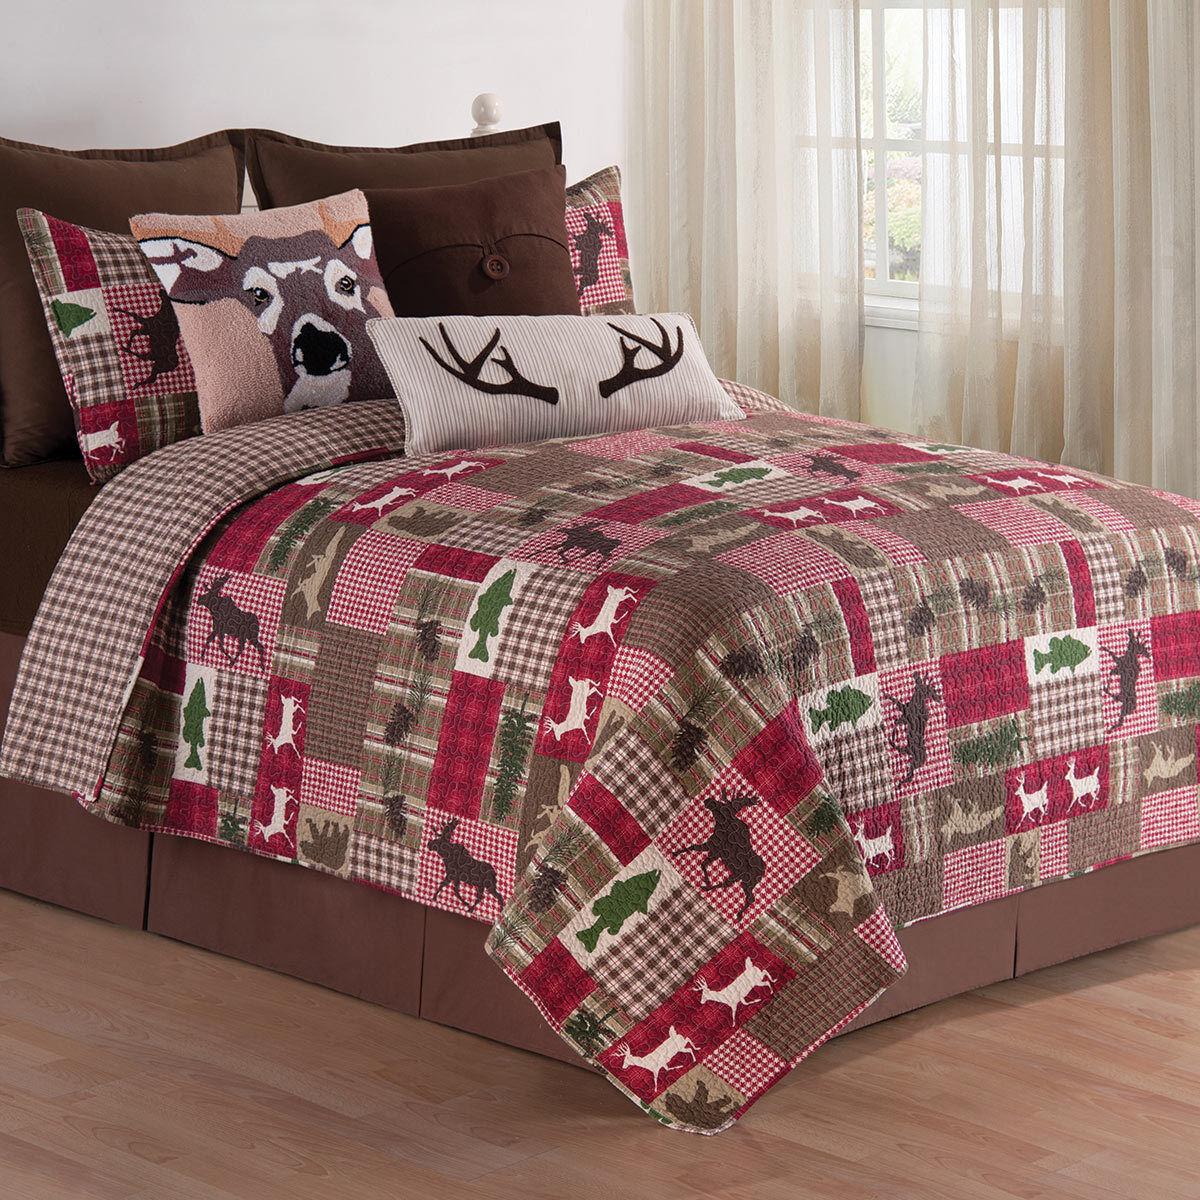 100% Cotton Rustic Wildlife Patchwork Cabin King Queen Full 3 pcs Quilt Set New